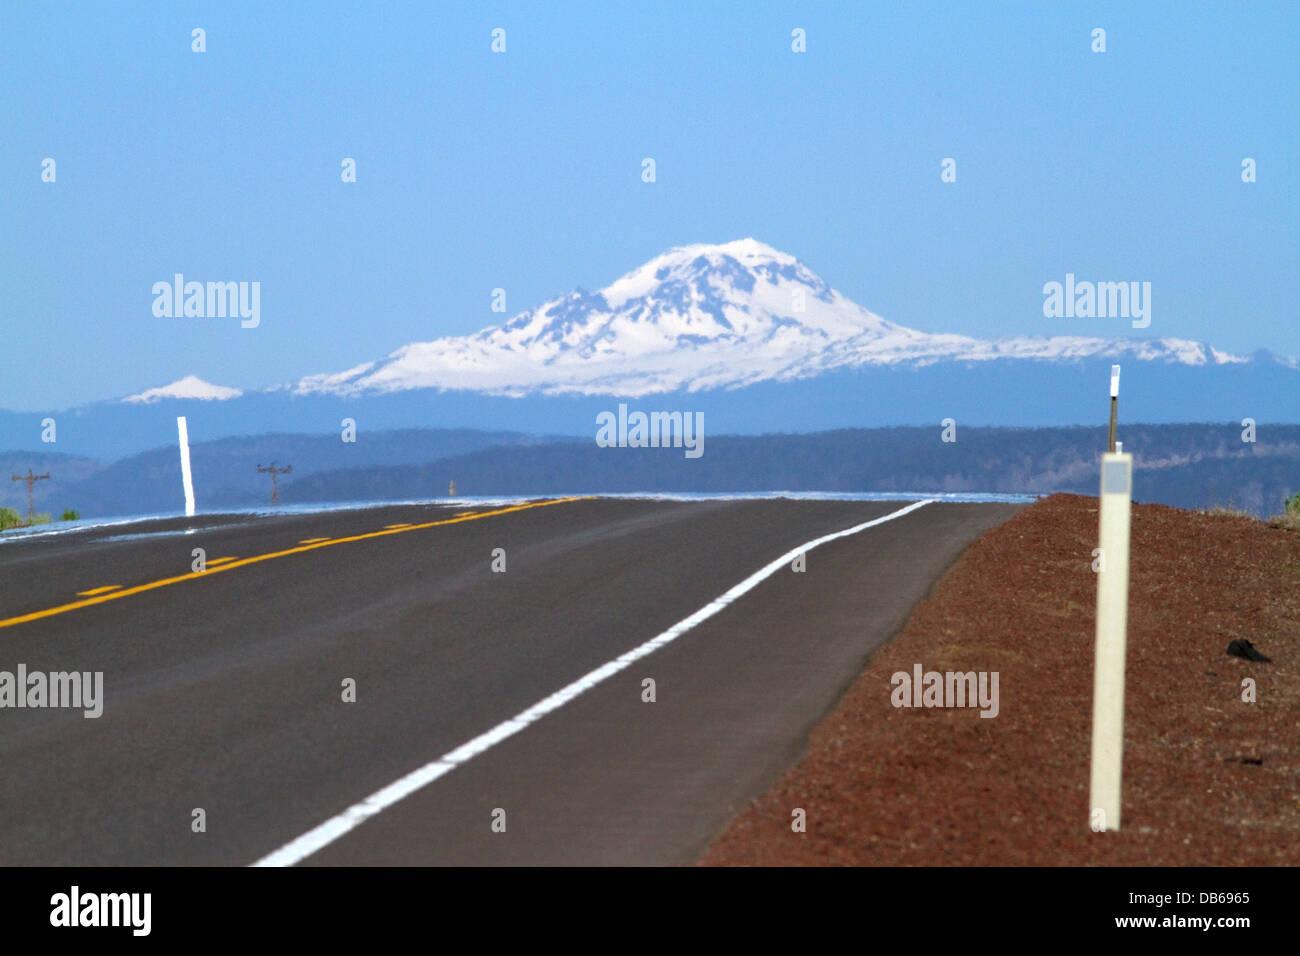 U.S. Route 20 east of Bend, Oregon, USA. - Stock Image